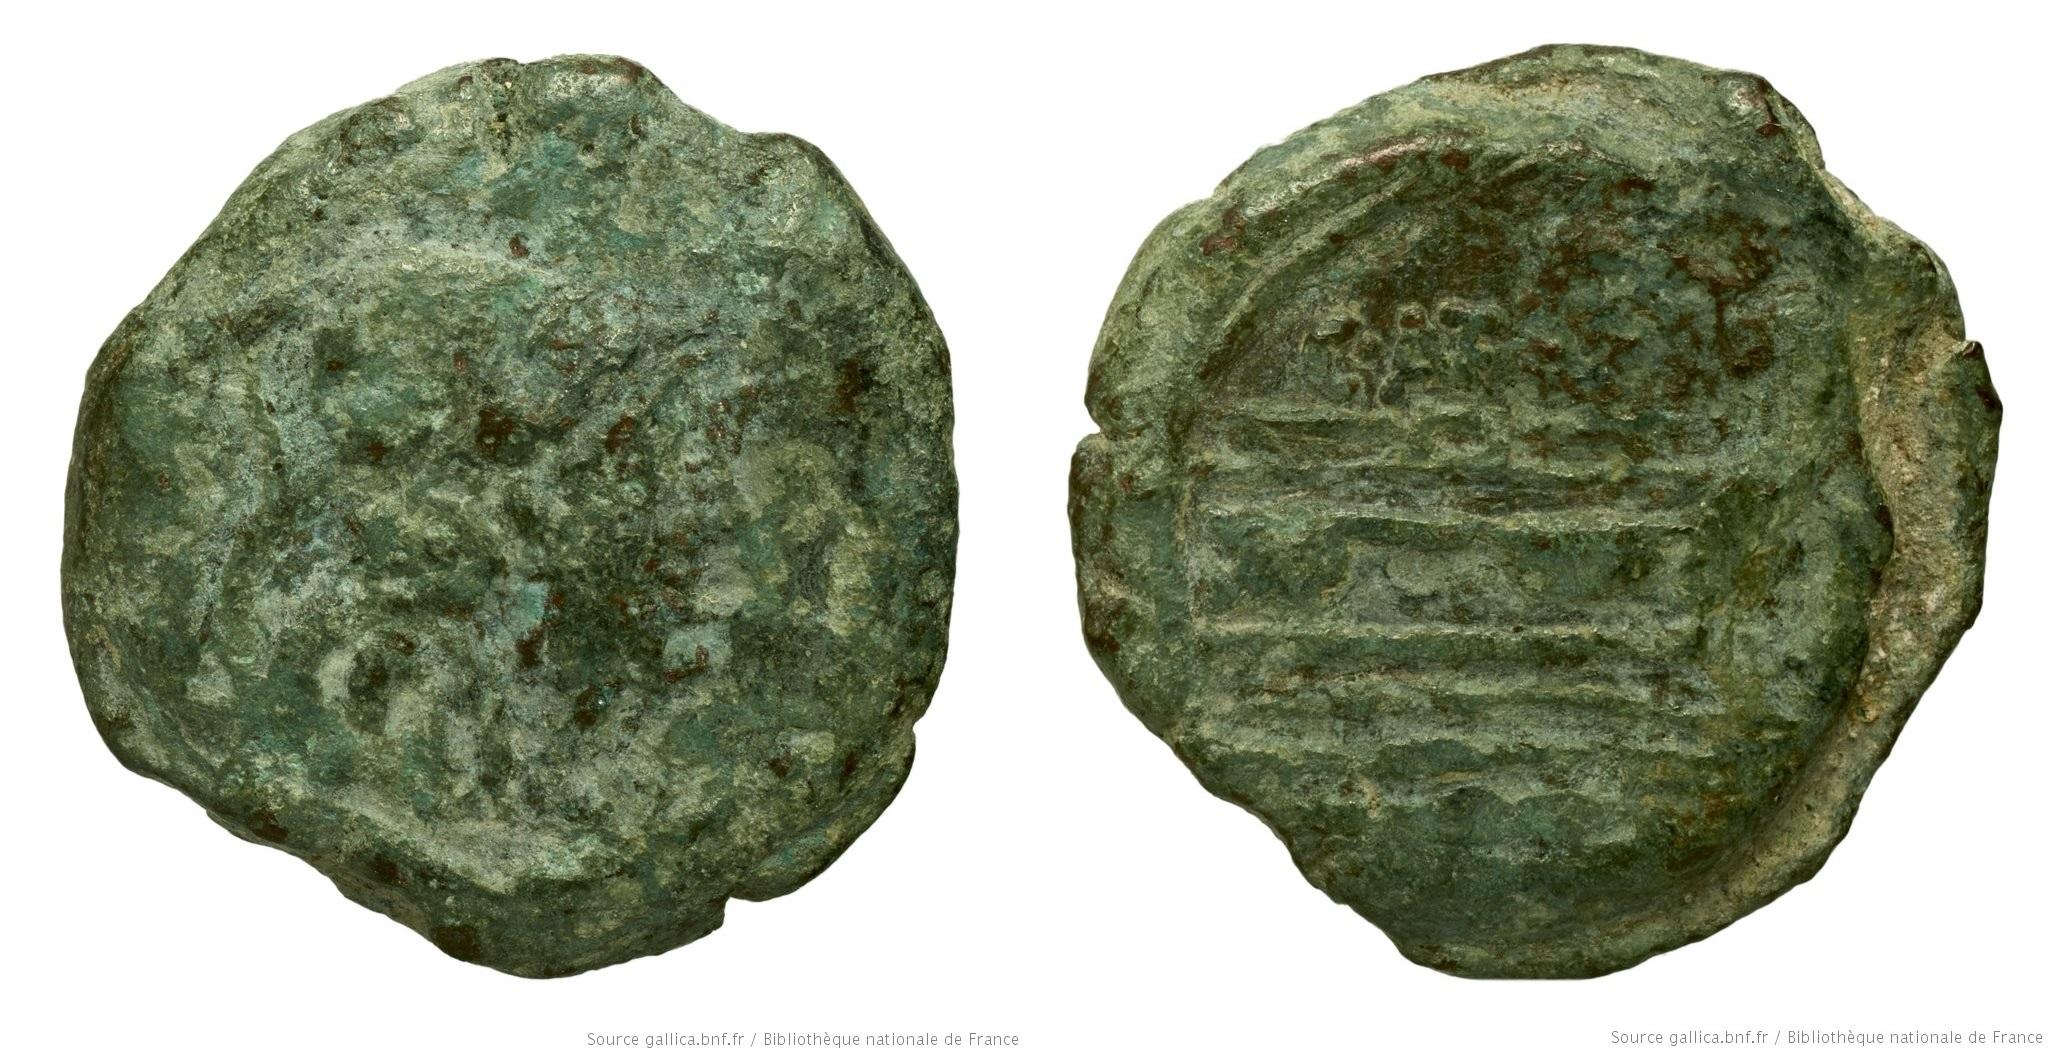 895AN – Triens Antestia – Caius Antestius